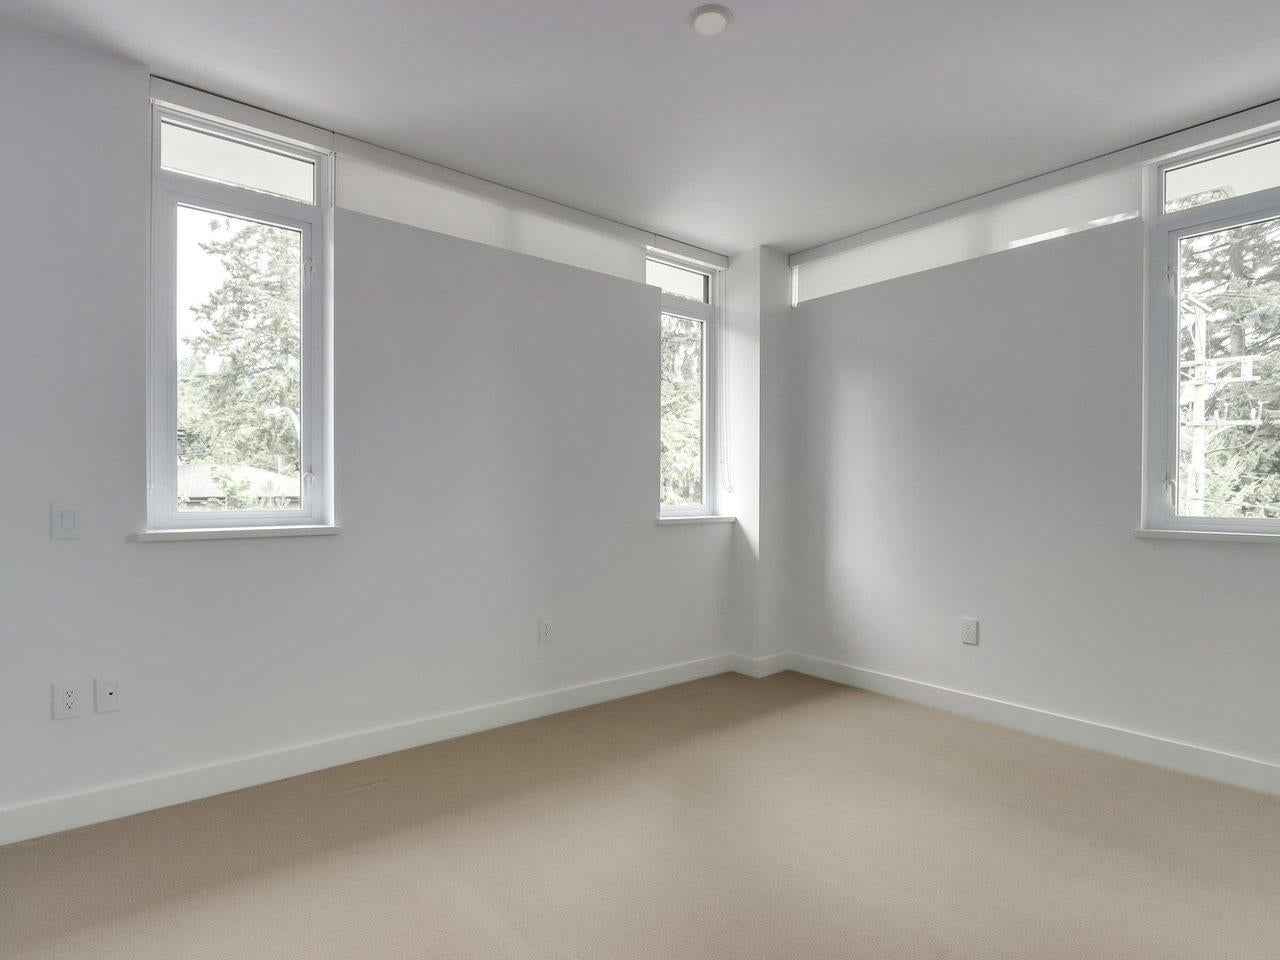 202 1055 RIDGEWOOD DRIVE - Edgemont Townhouse for sale, 3 Bedrooms (R2611487) - #17